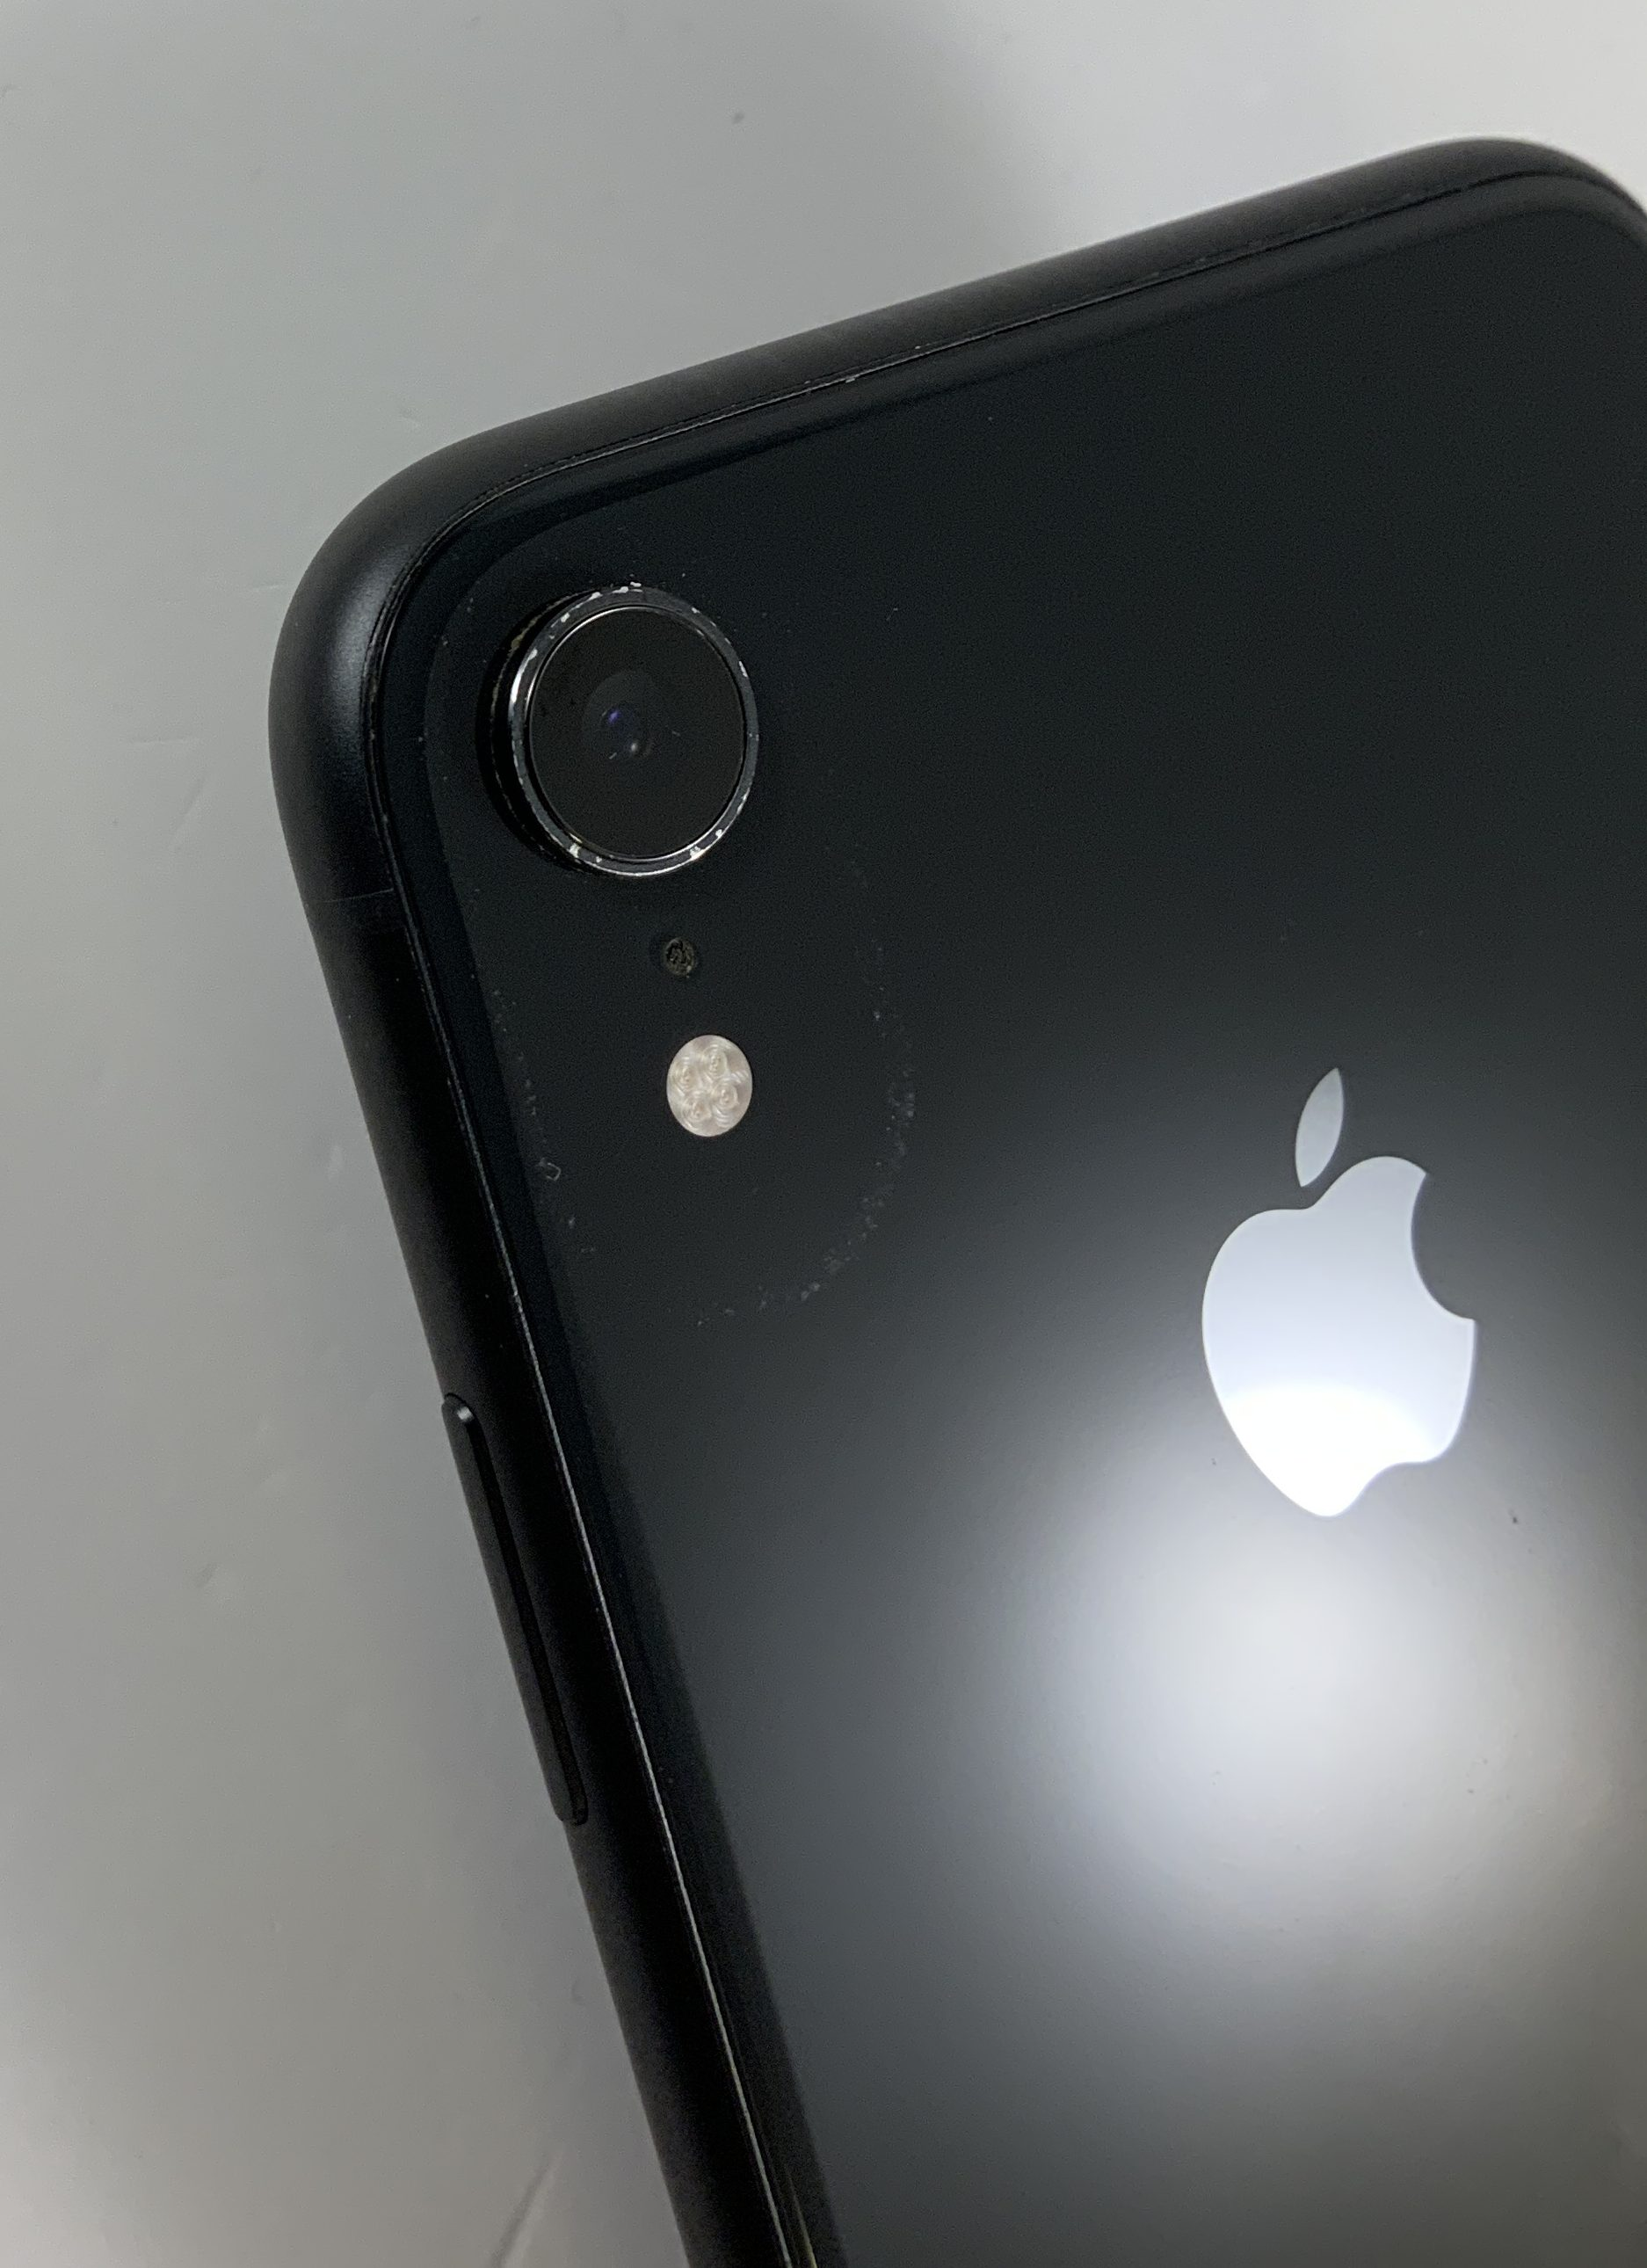 iPhone XR 64GB, 64GB, Black, image 3